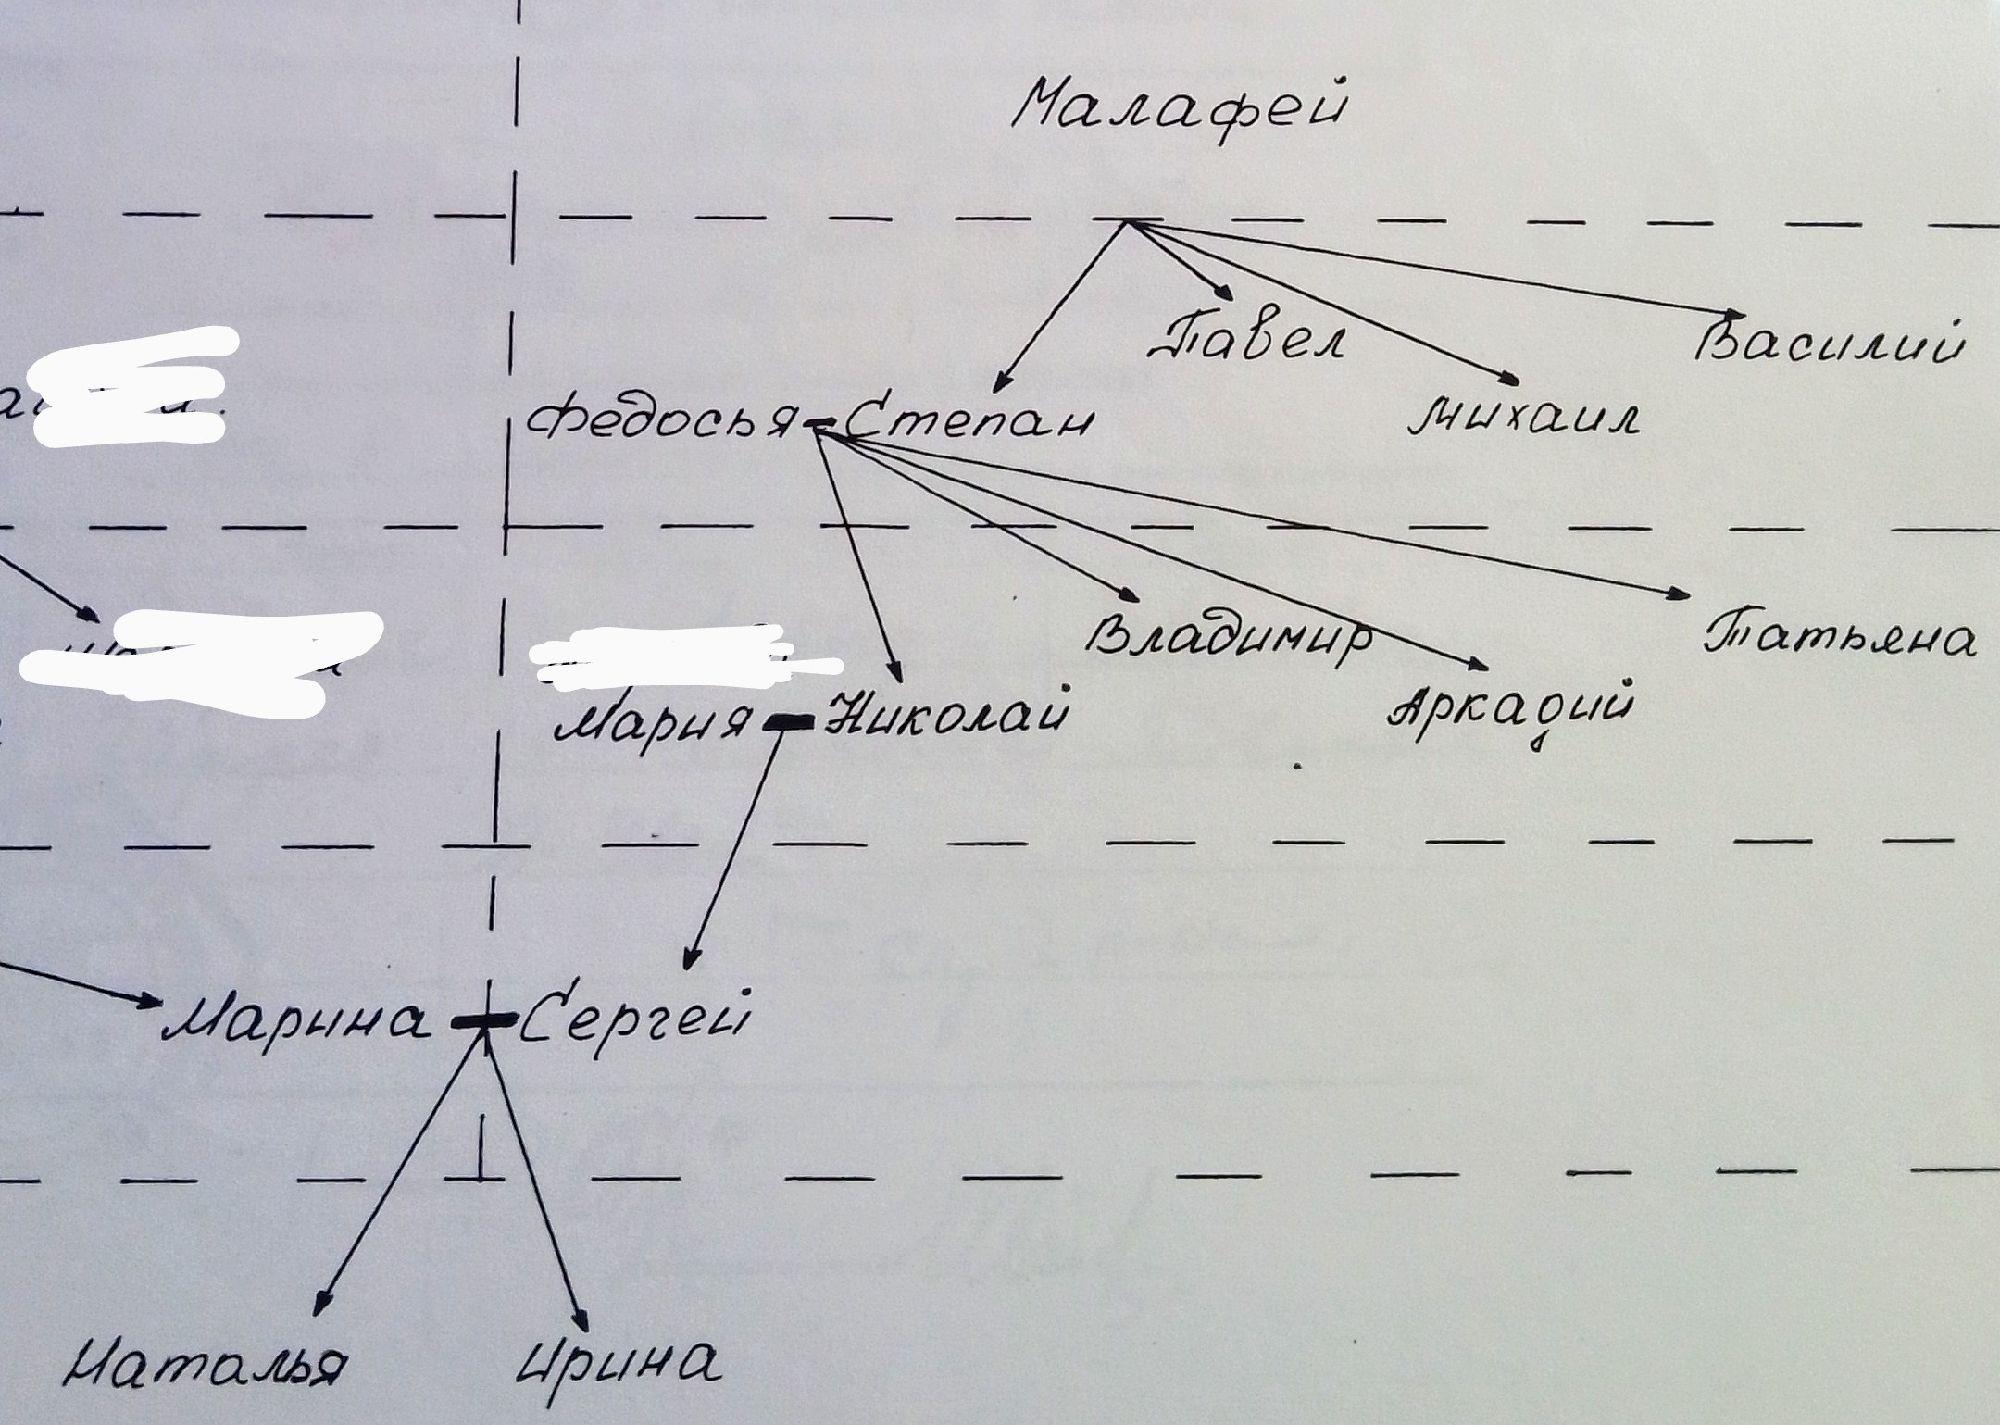 Генеалогическое древо по линии отца